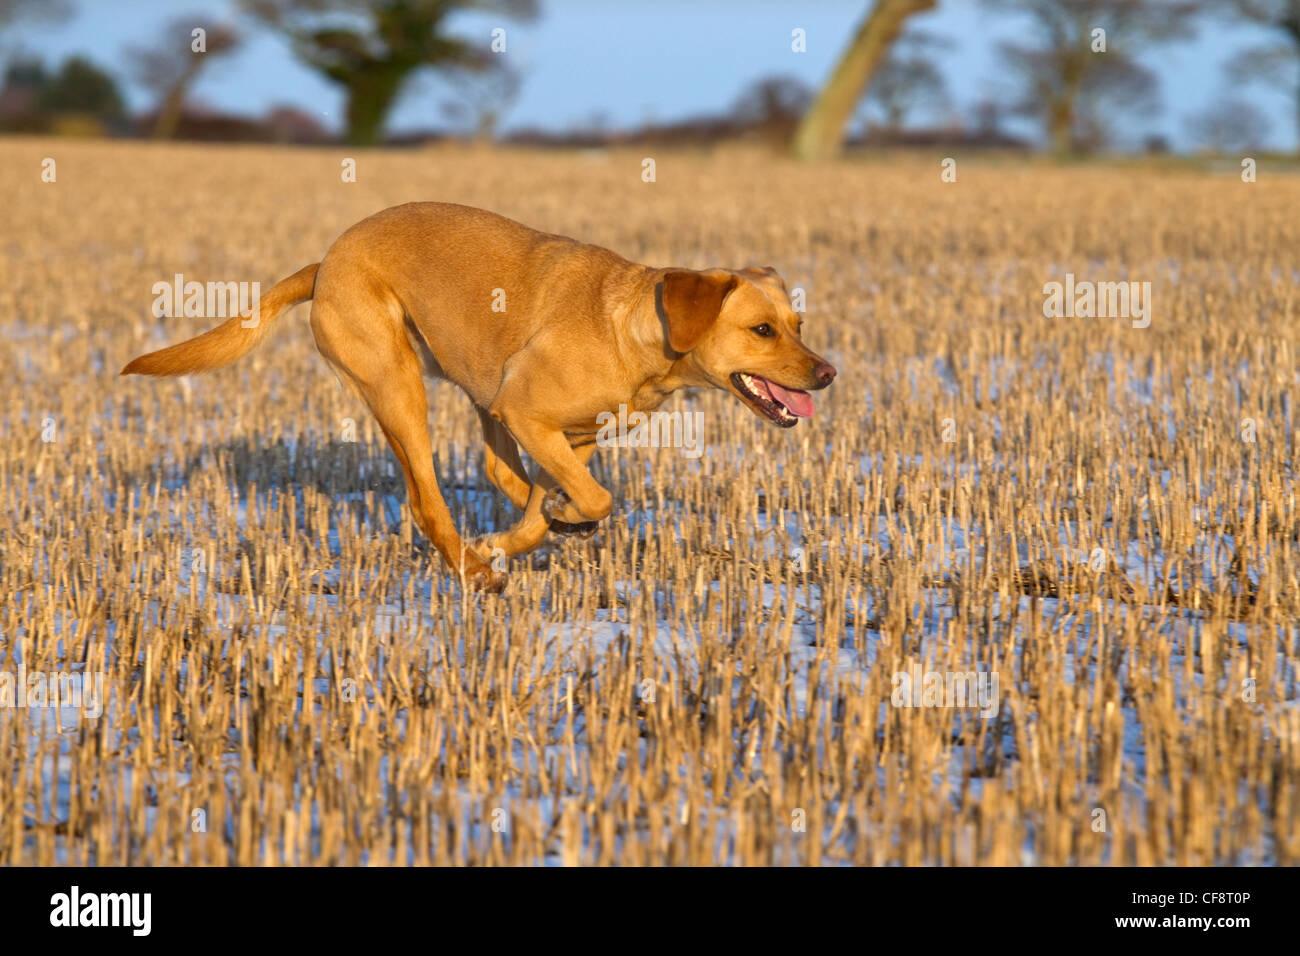 Yellow Labrador running in snow - Stock Image